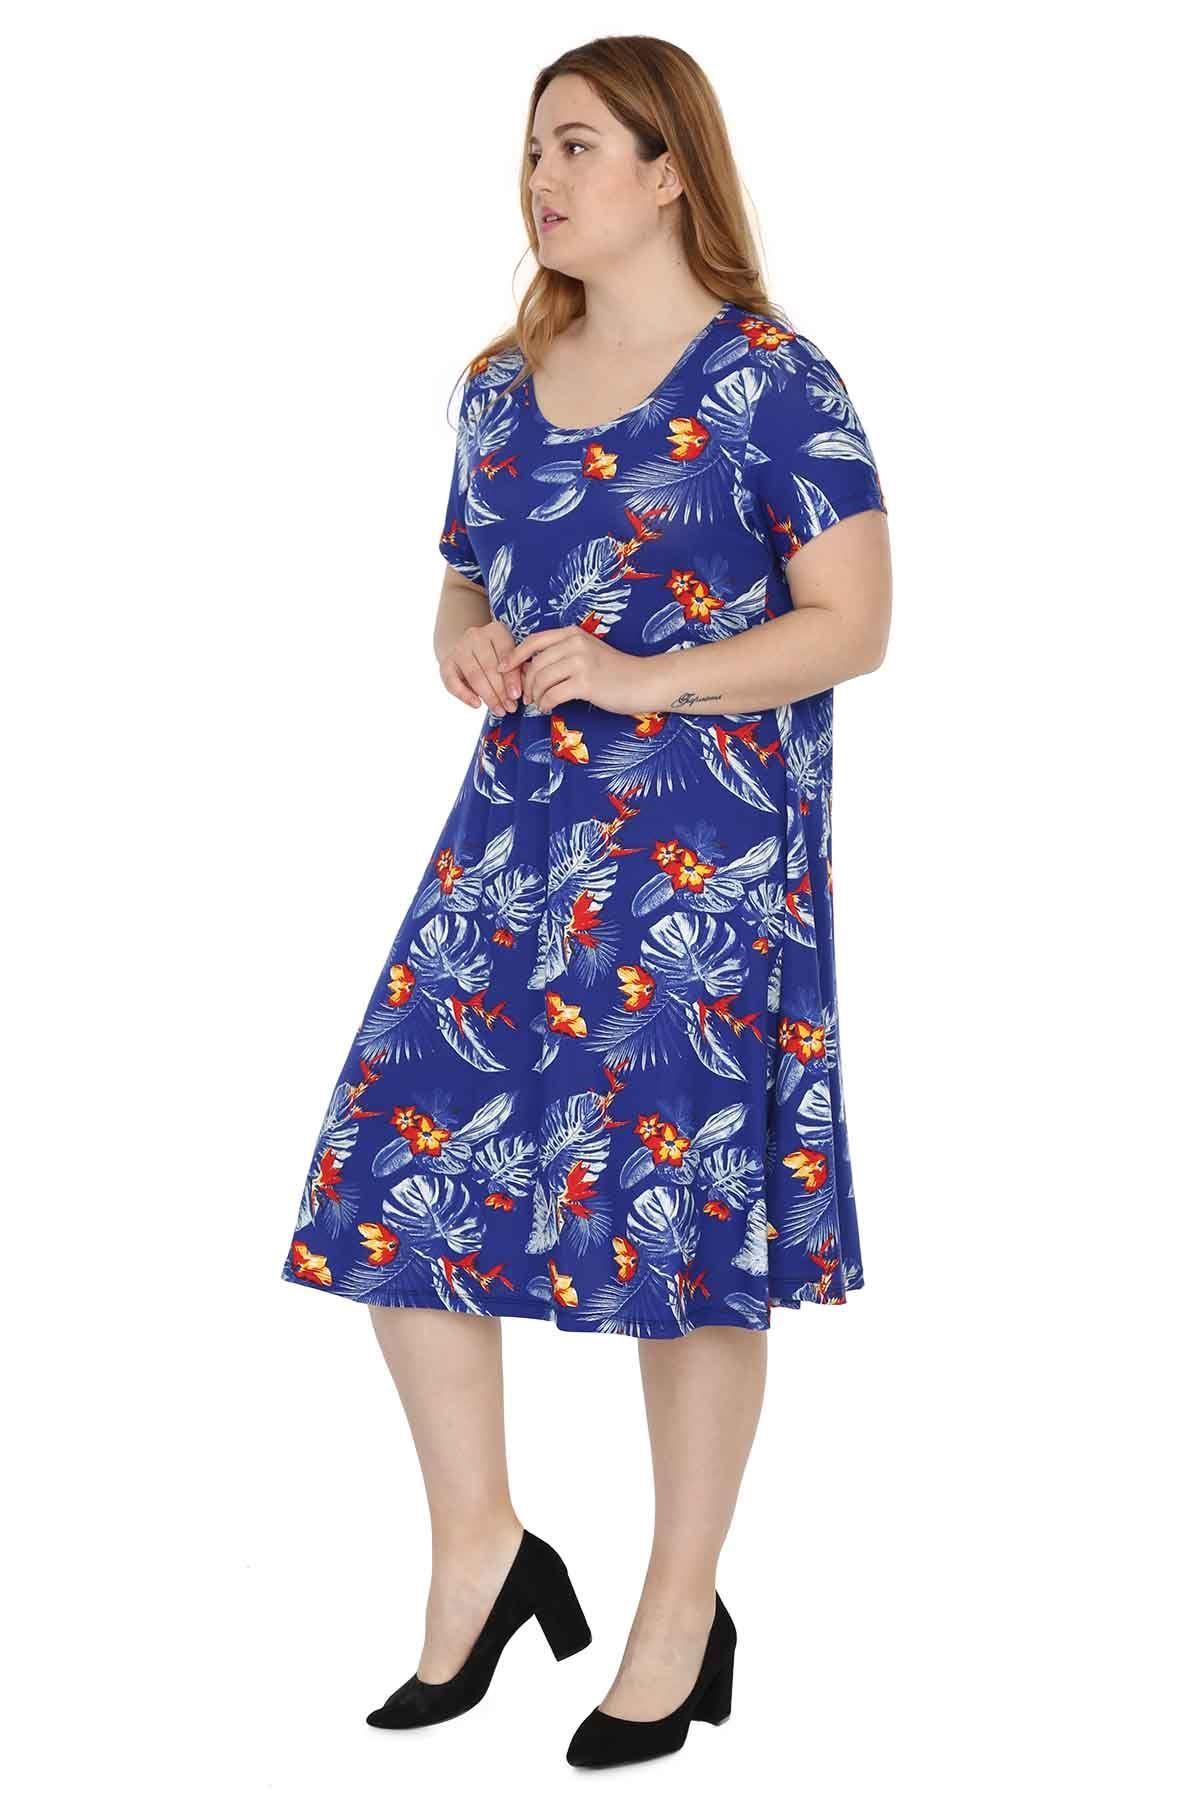 Mavi Kısa Kol Elbise 2A-0530